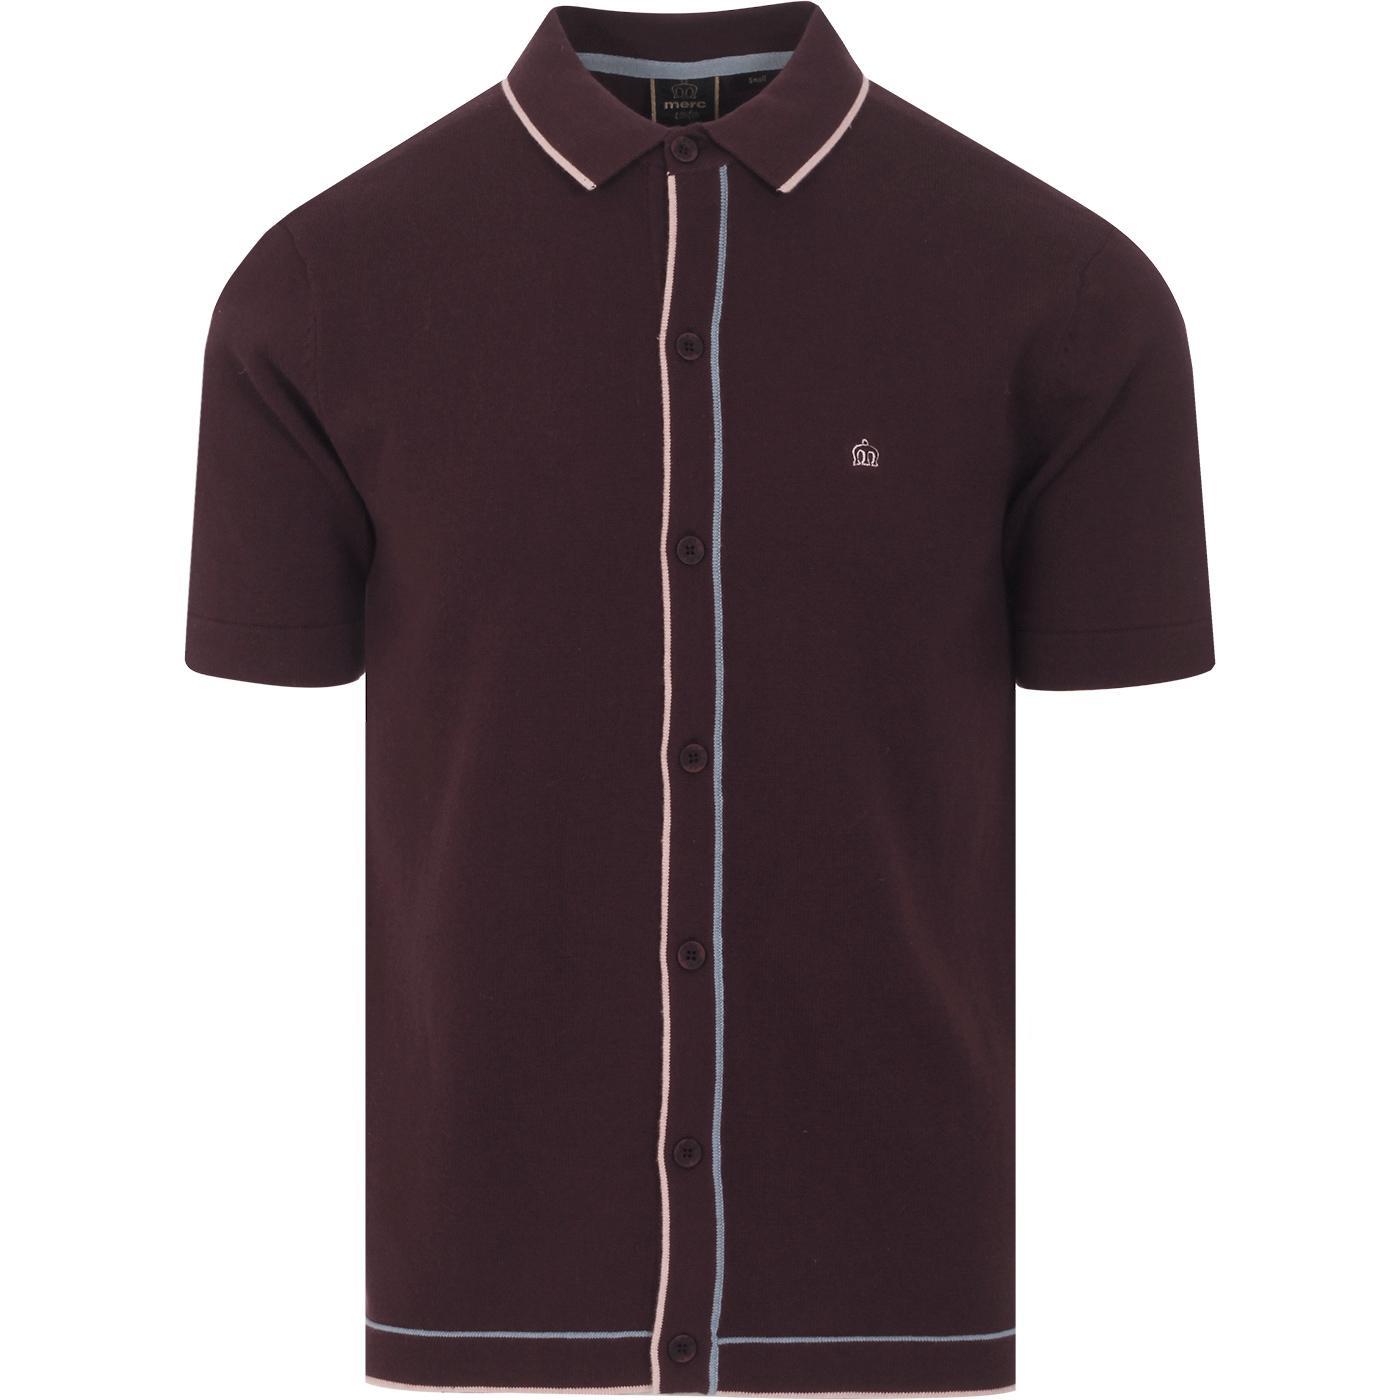 Devon MERC Mod Tipped Knit Button Through Polo Top